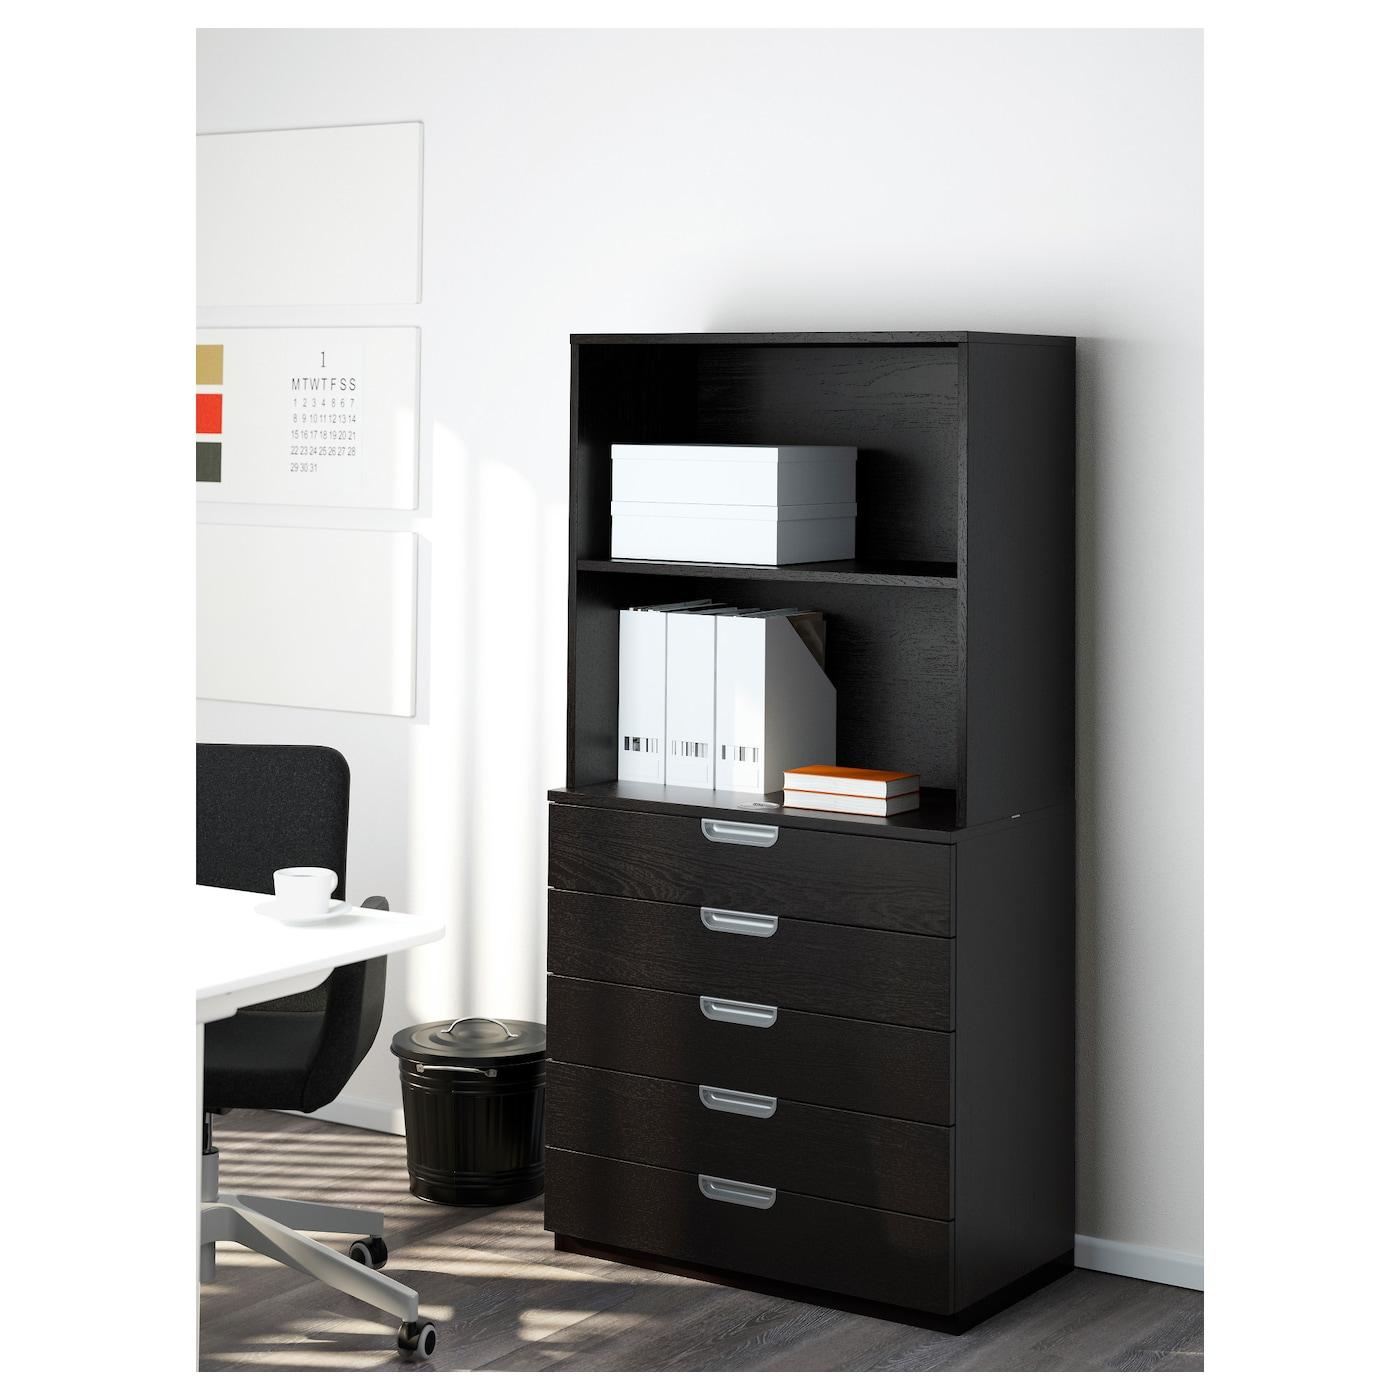 Galant combinaison rangement tiroirs brun noir 80x160 cm for Rangement bureau noir